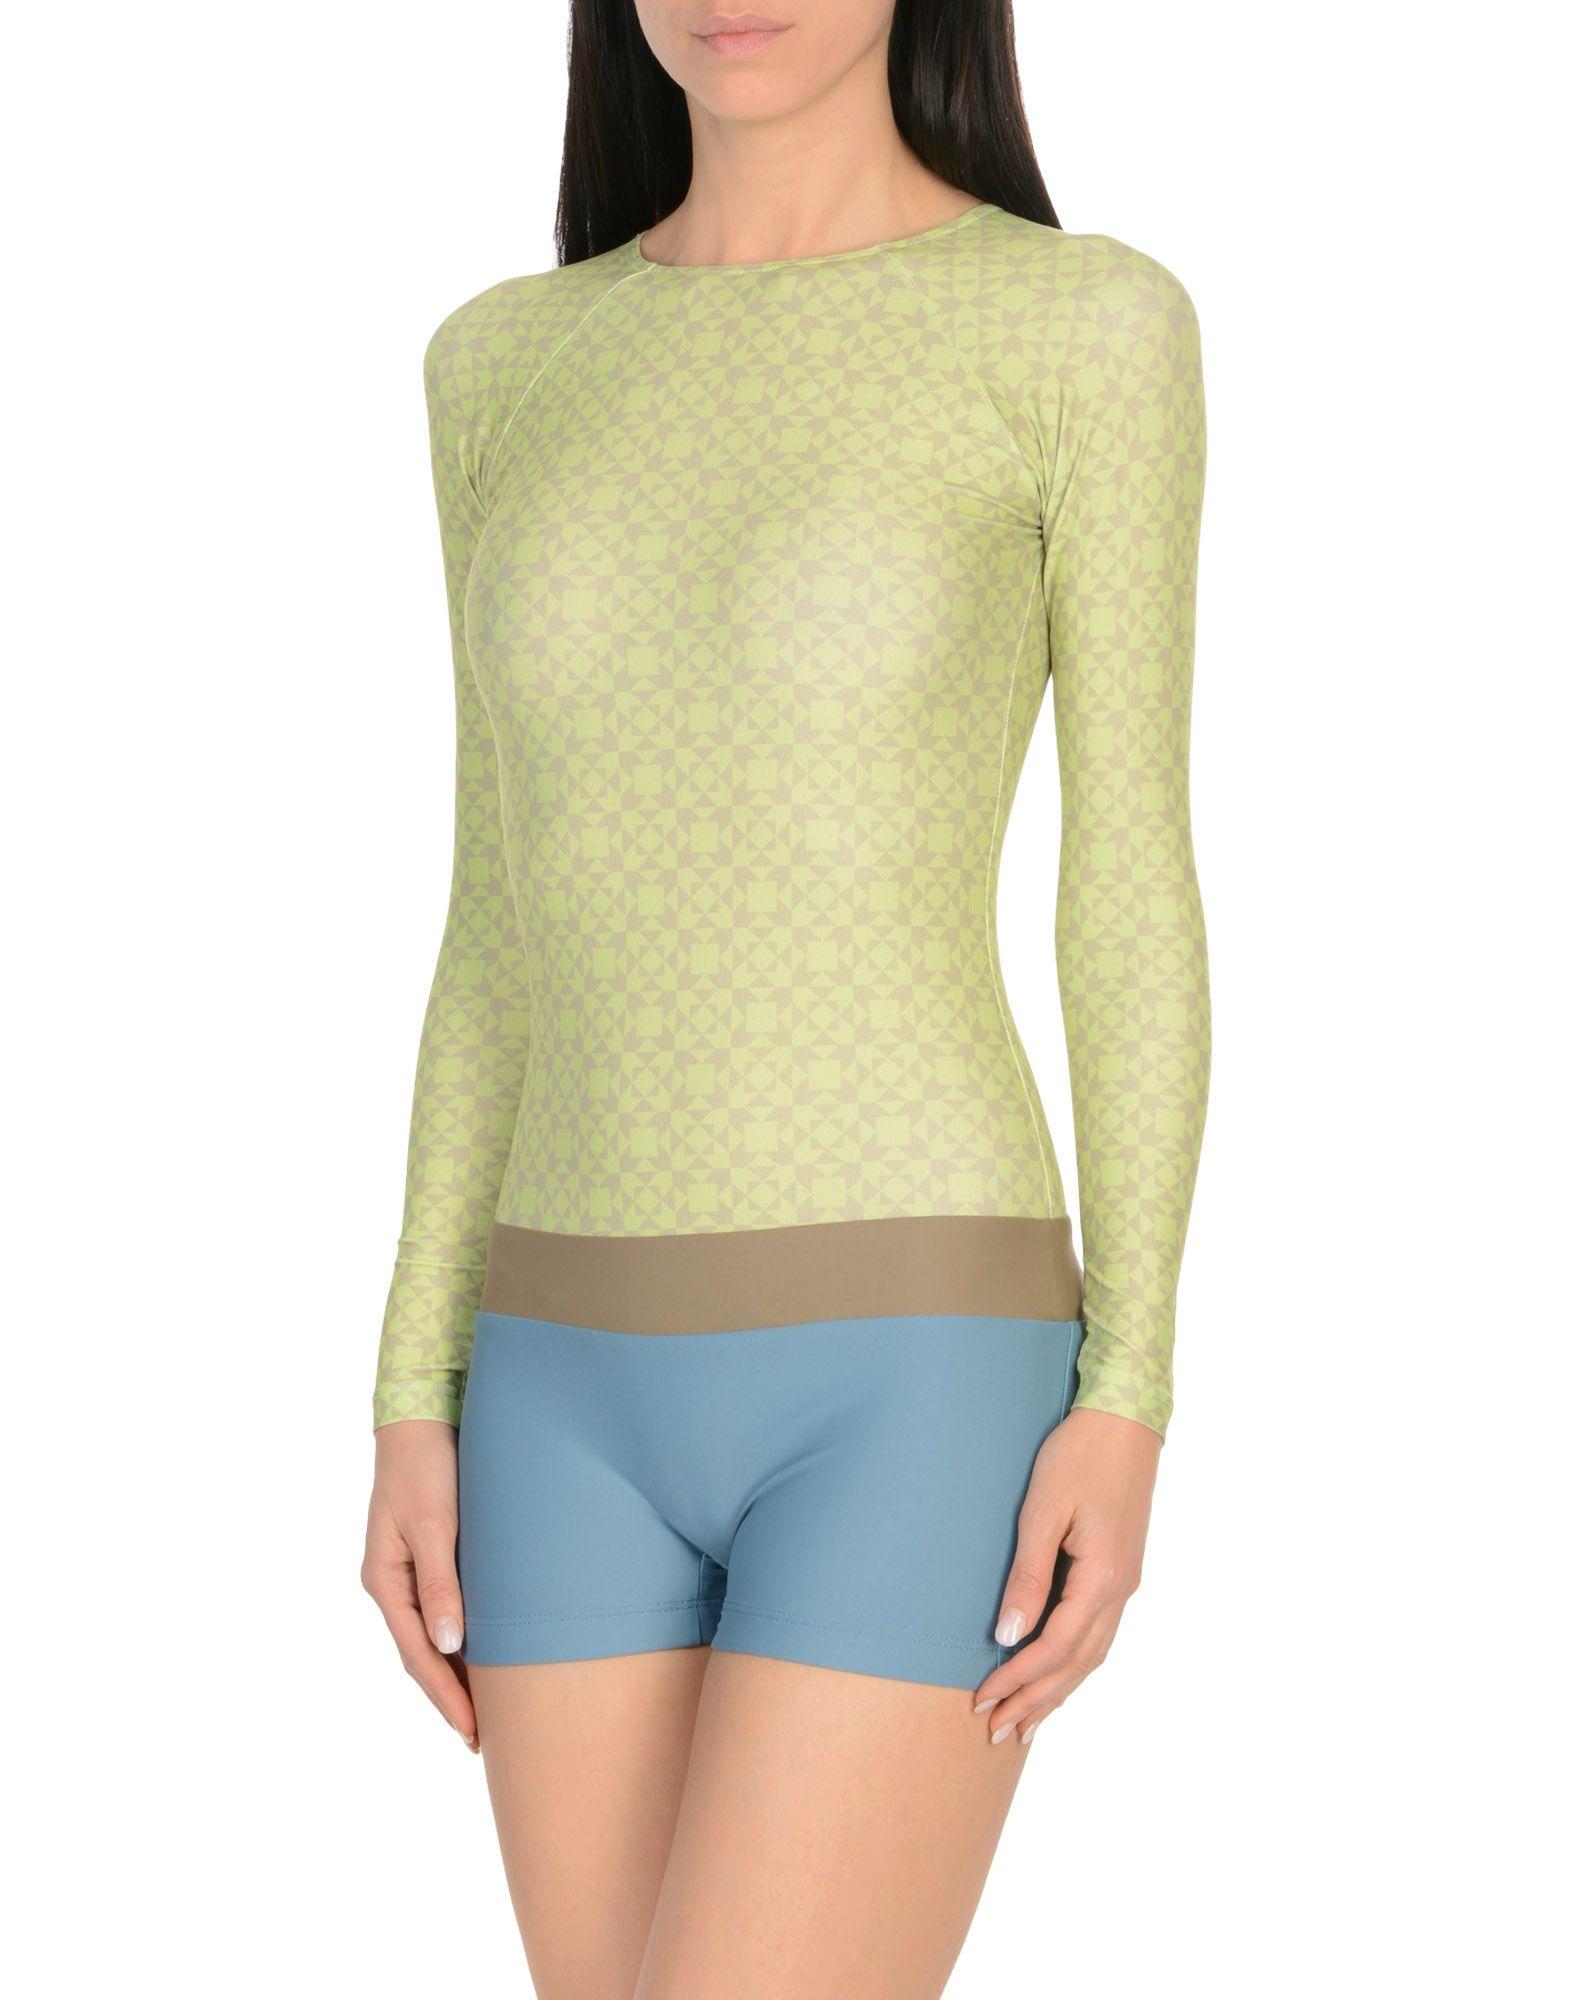 SEEA One-Piece Swimsuits in Light Green